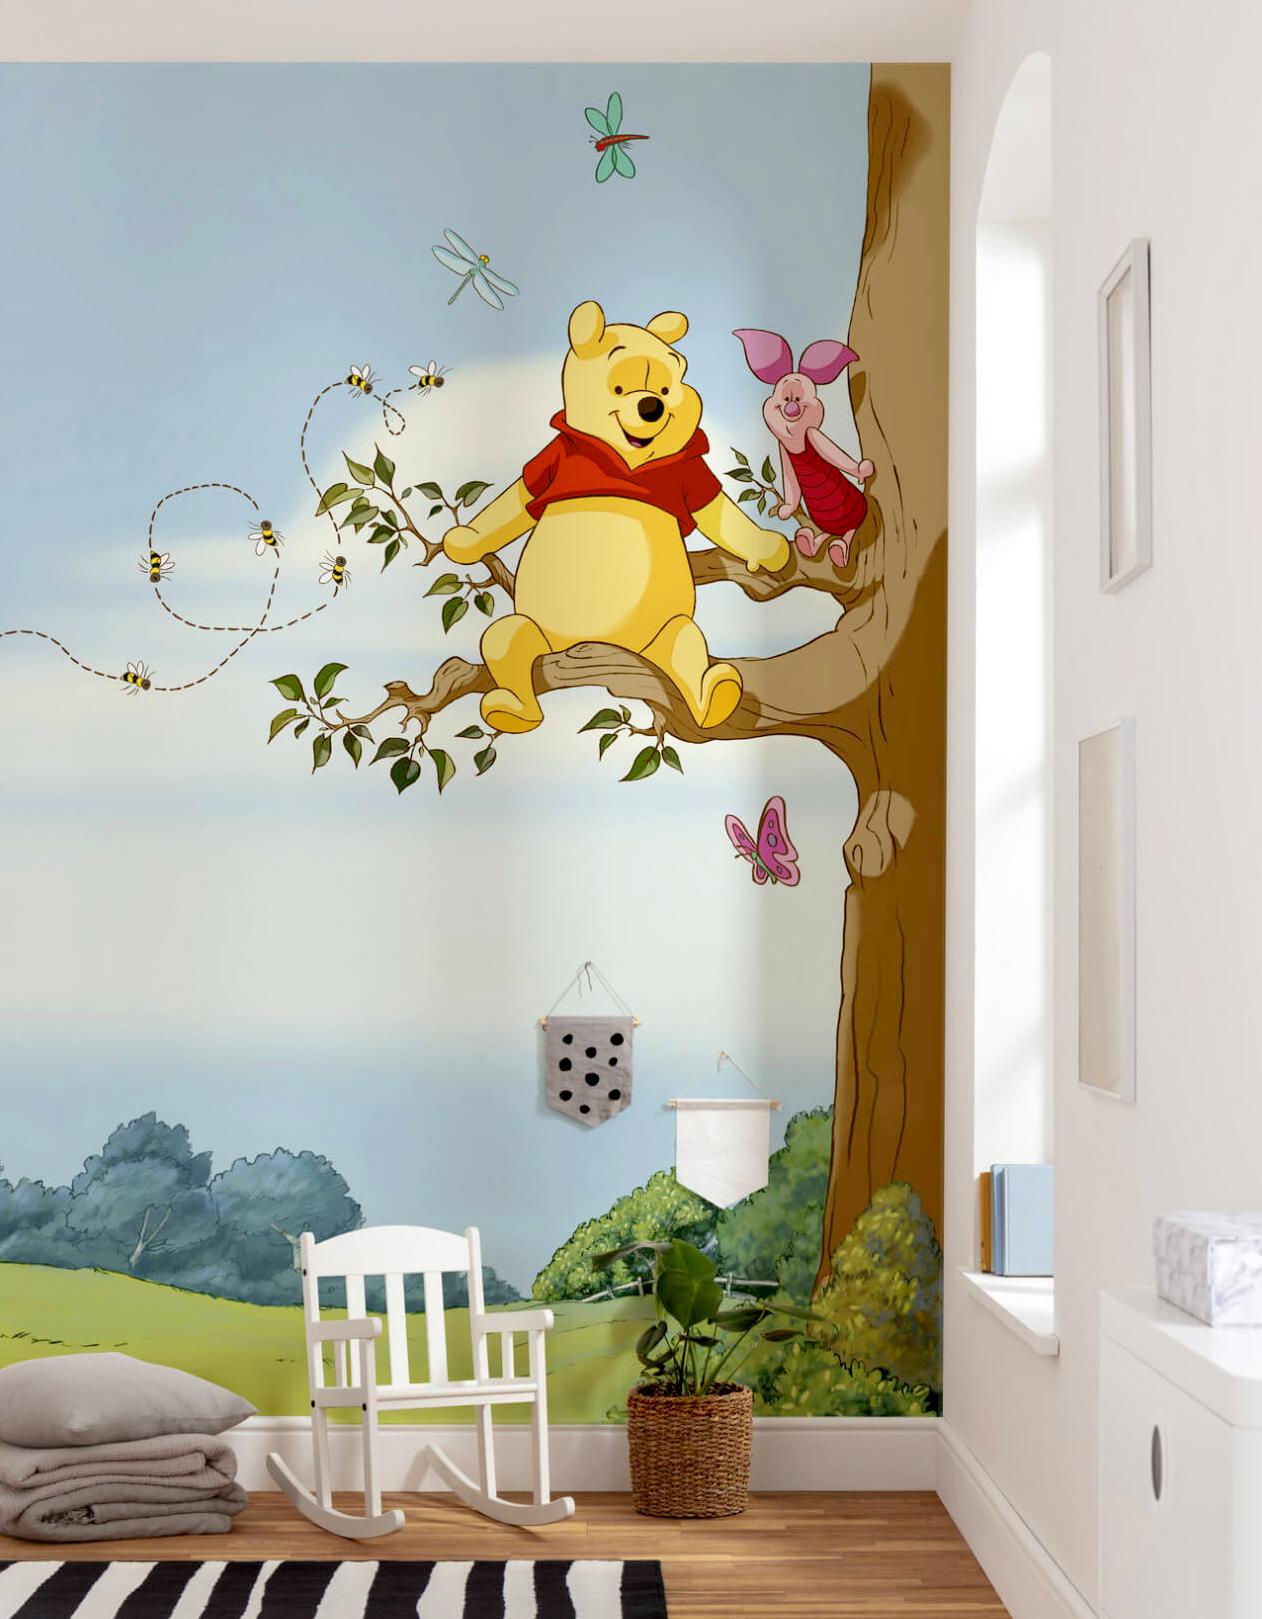 winnie-the-pooh-wall-mural-wallpaper-32828-p